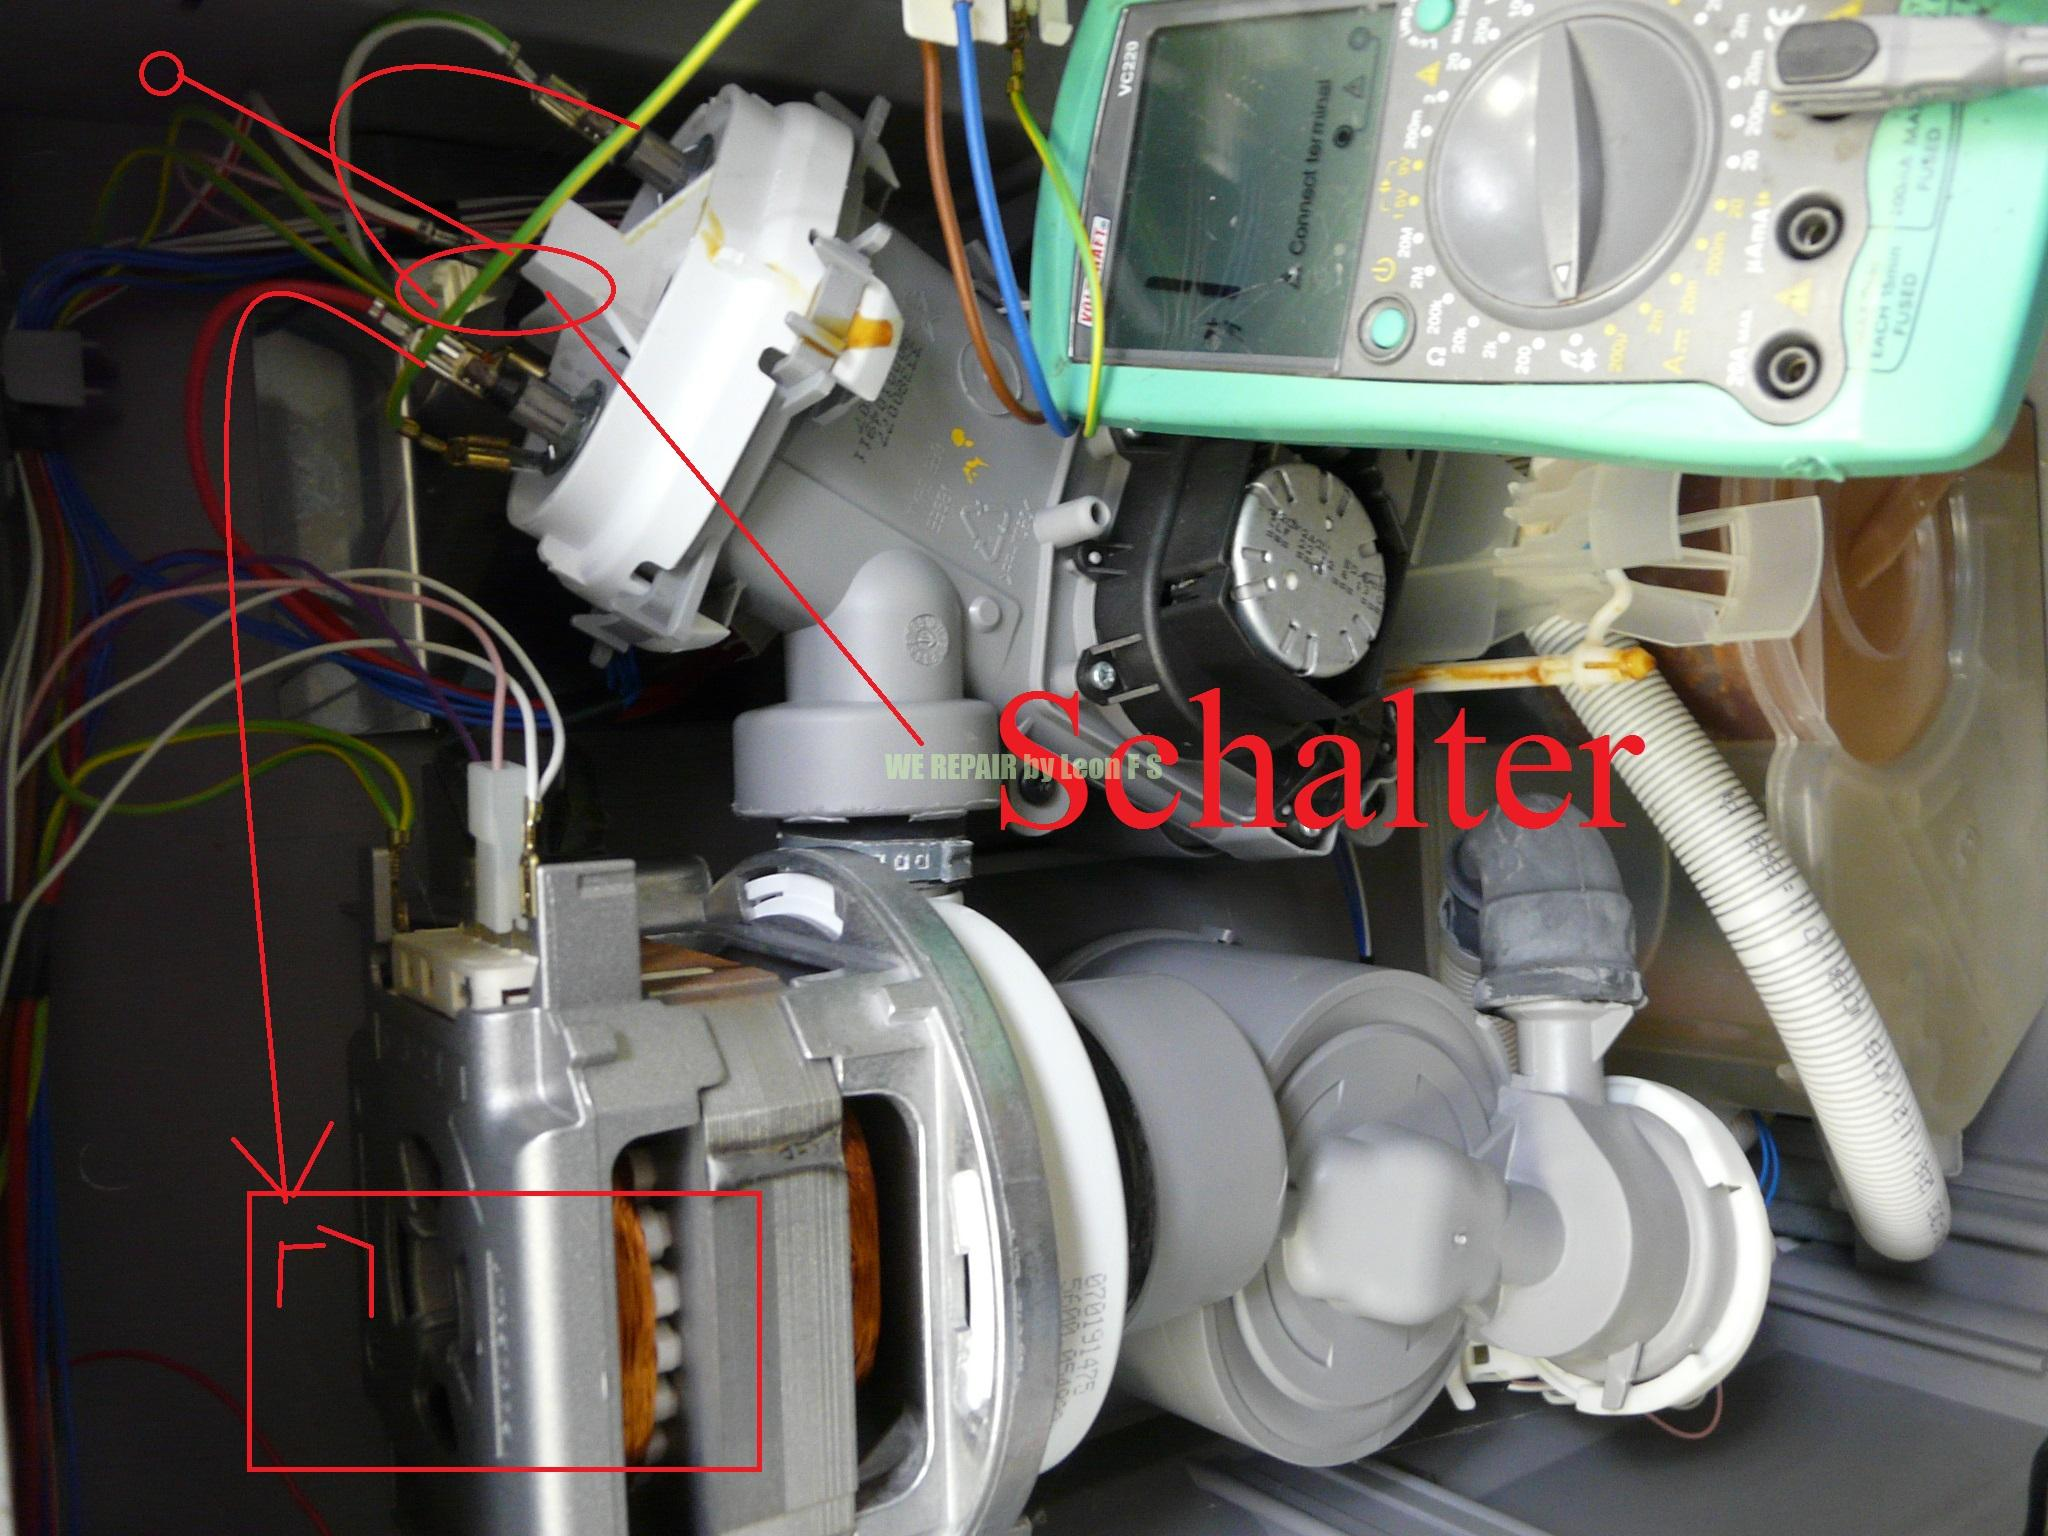 Turbo Siemens Geschirrspüler Ohne Strom | Siemens Sn214w00ae Stand LI88